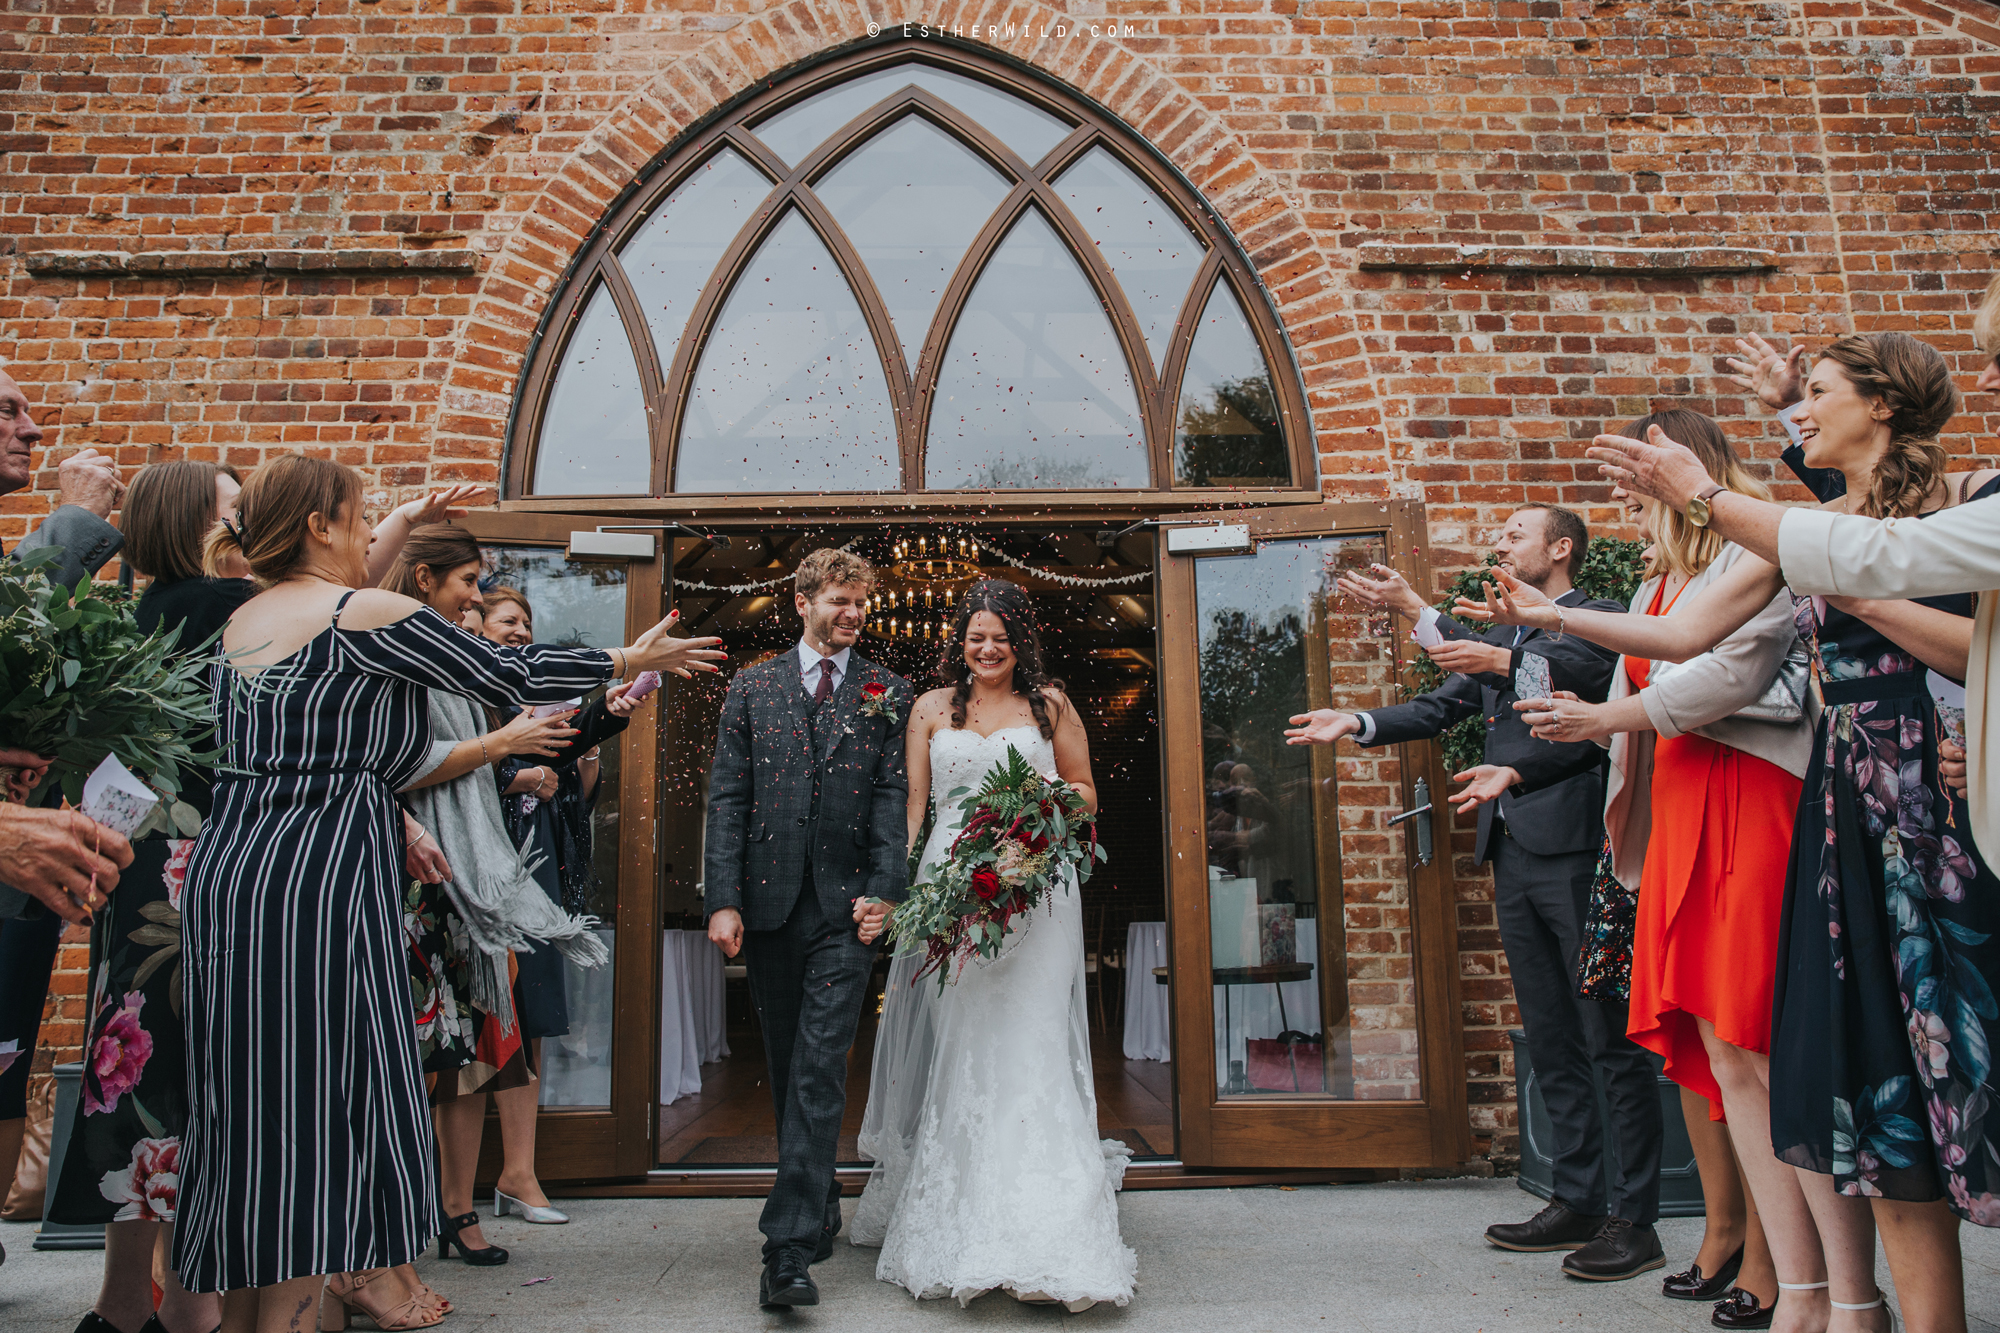 Reading_Room_Weddings_Alby_Norwich_Photographer_Esther_Wild_IMG_1143.jpg